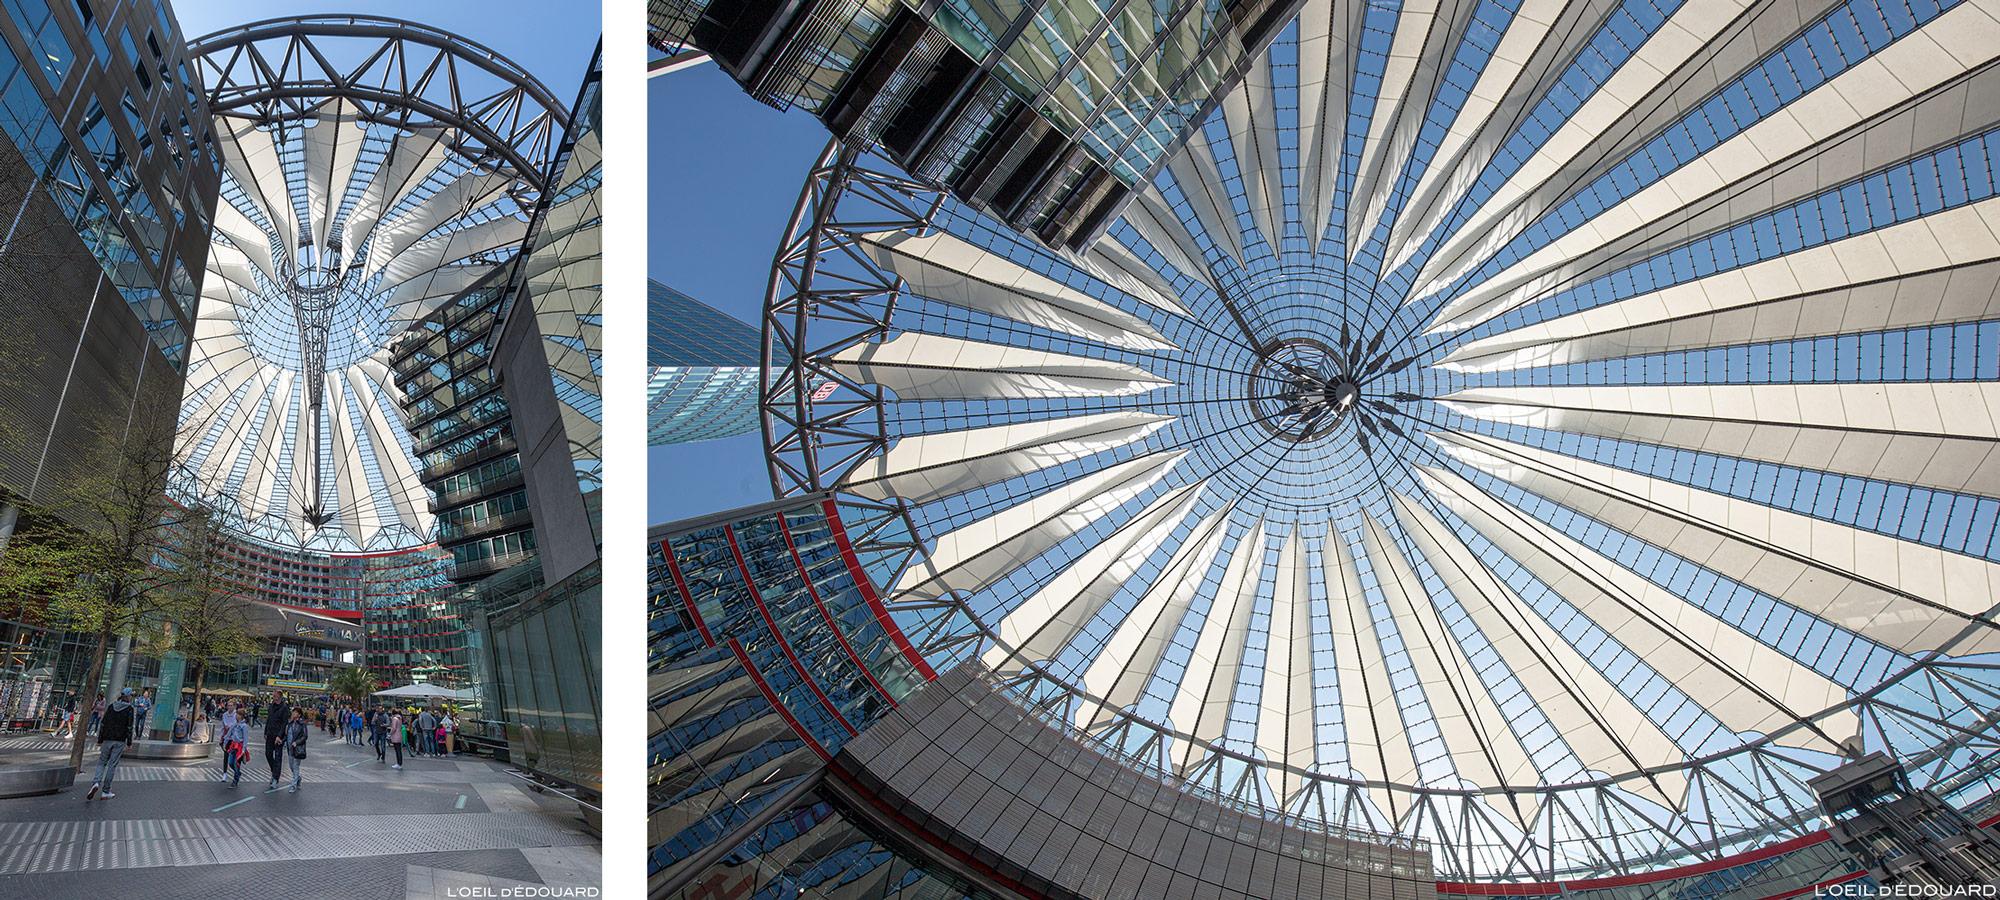 Sony Center Berlin Germany, Potsdamer Platz / Edifícios arquitetônicos Alemanha / Alemanha Helmut Jahn architect